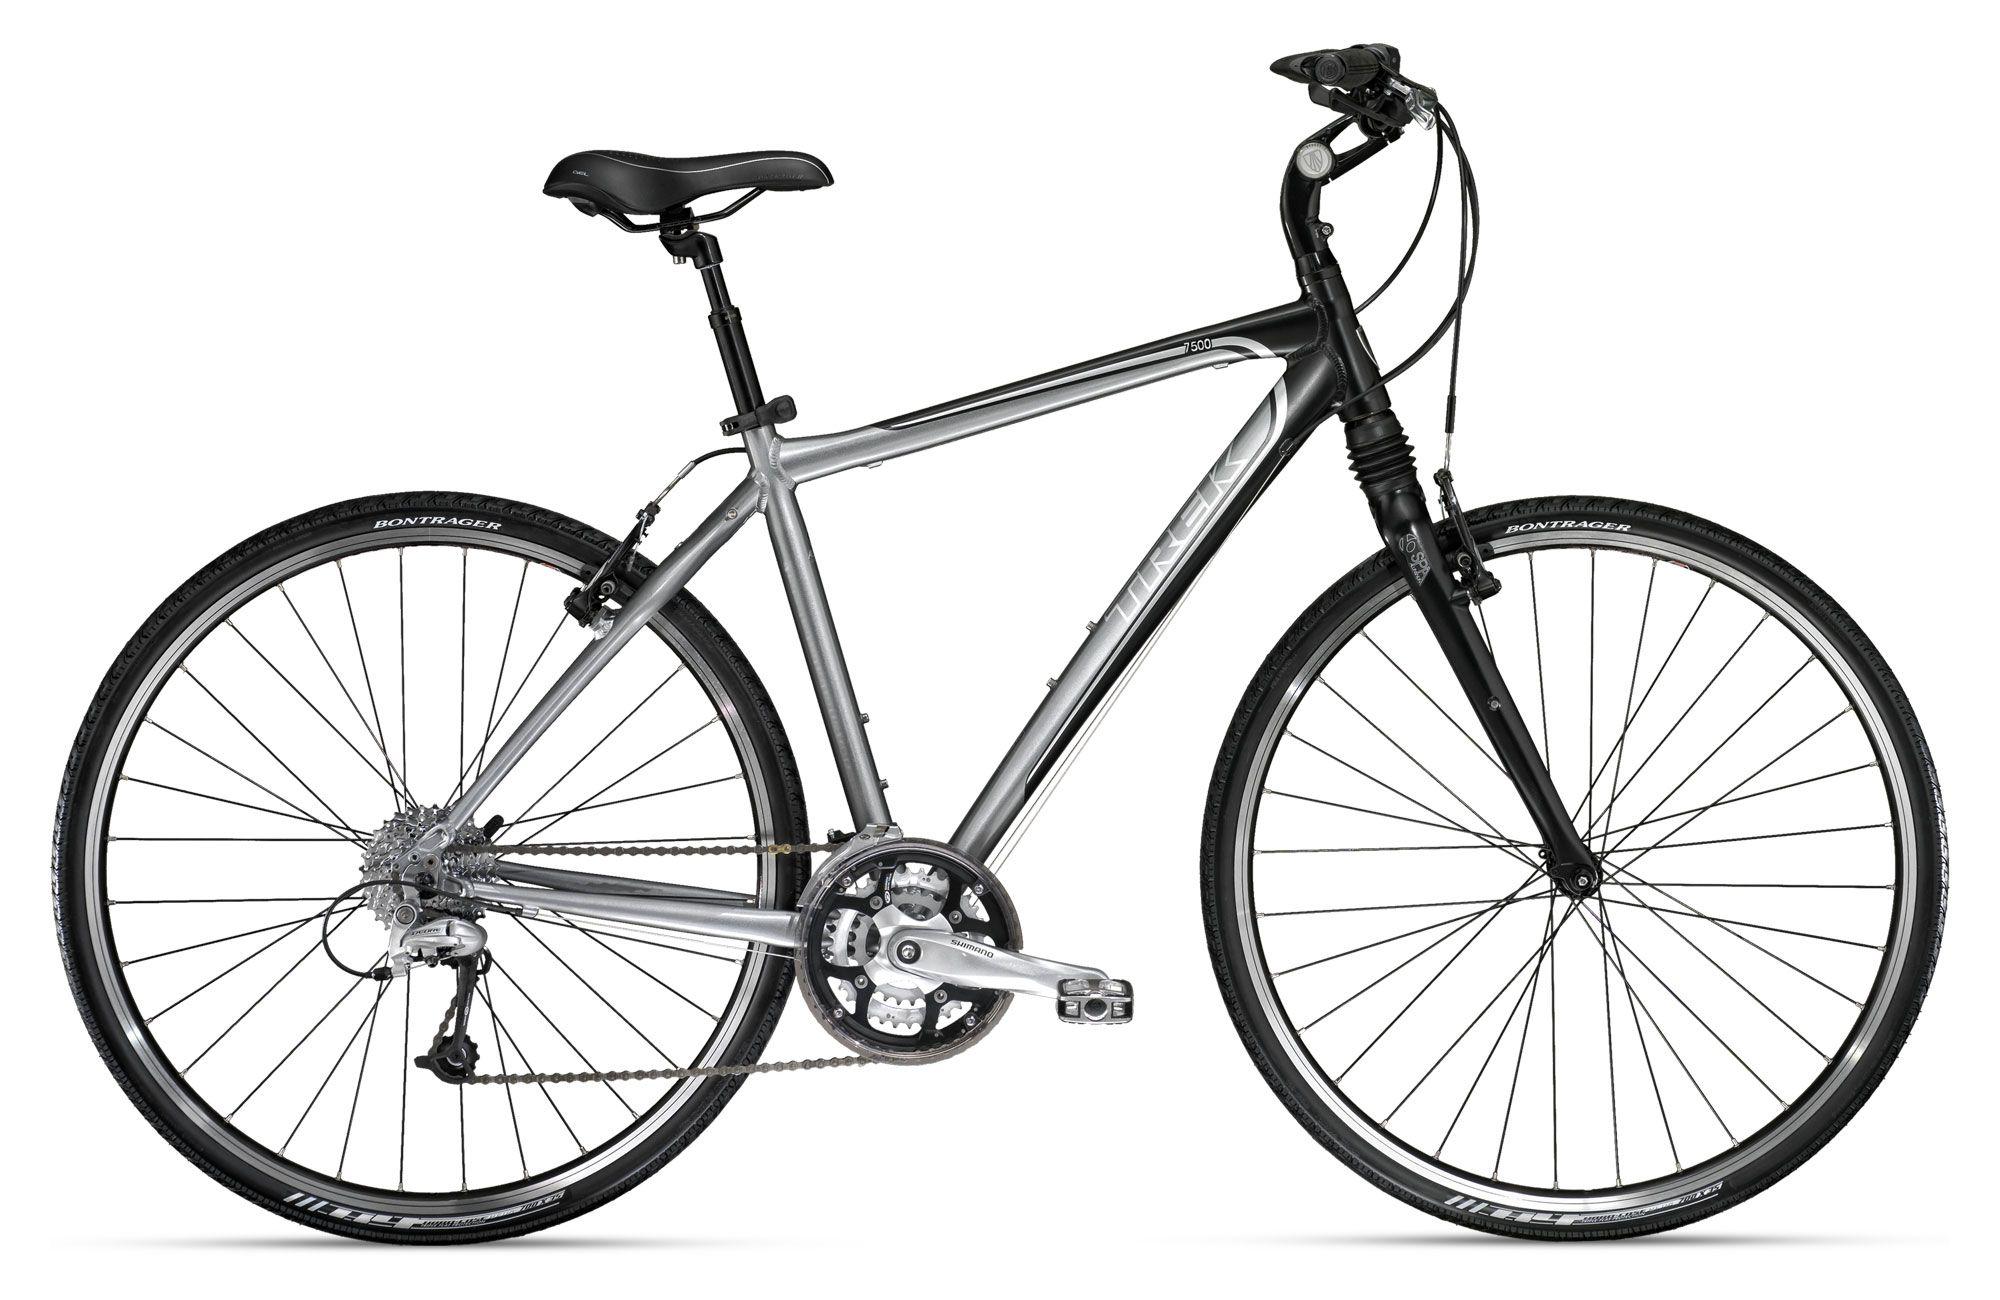 Trek Hybrid 7500 Bike Comfort bike, Trek bikes, Trek